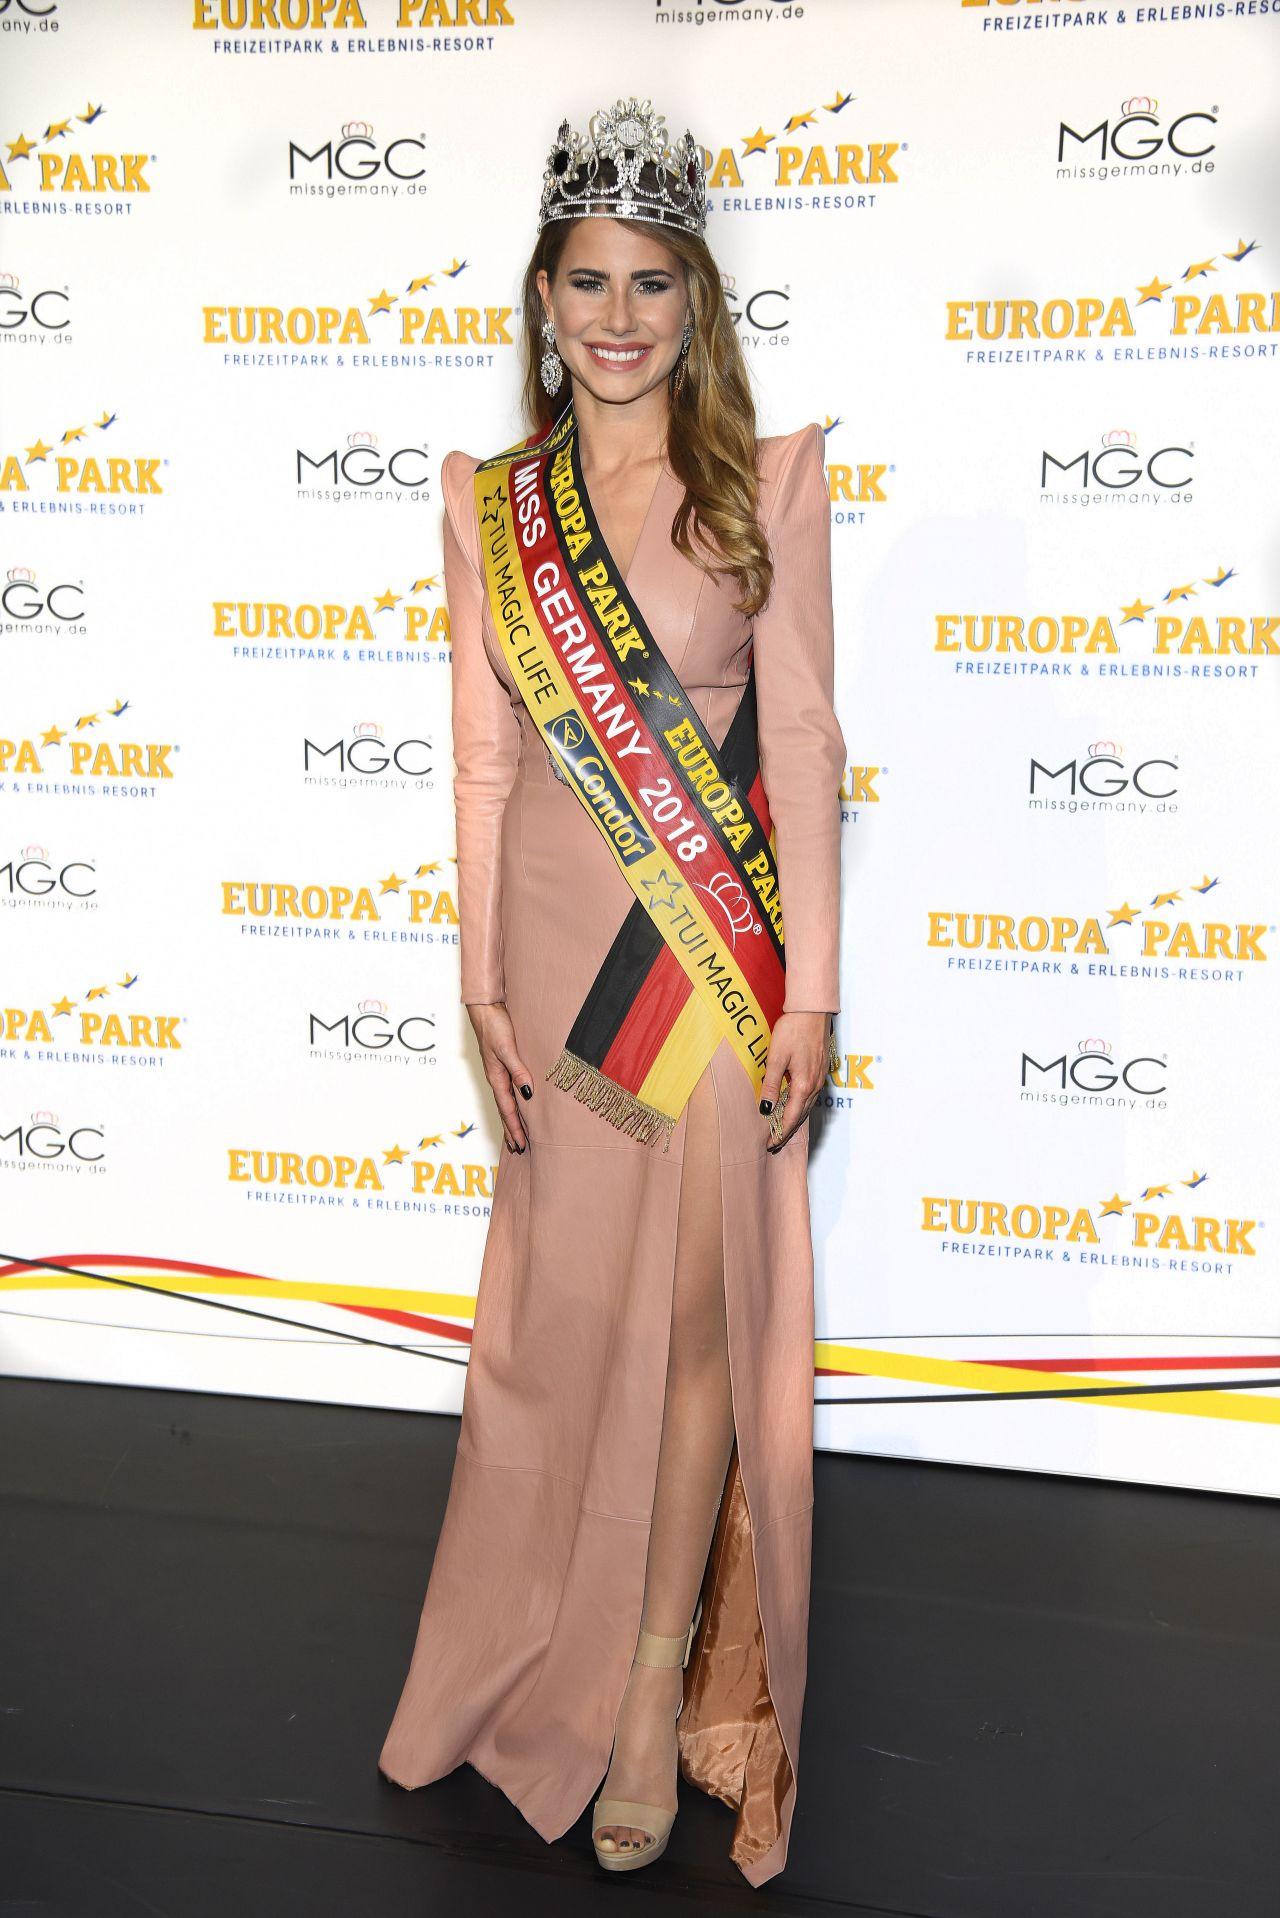 Anahita Rehbein - Miss Germany 2018 • CelebMafia